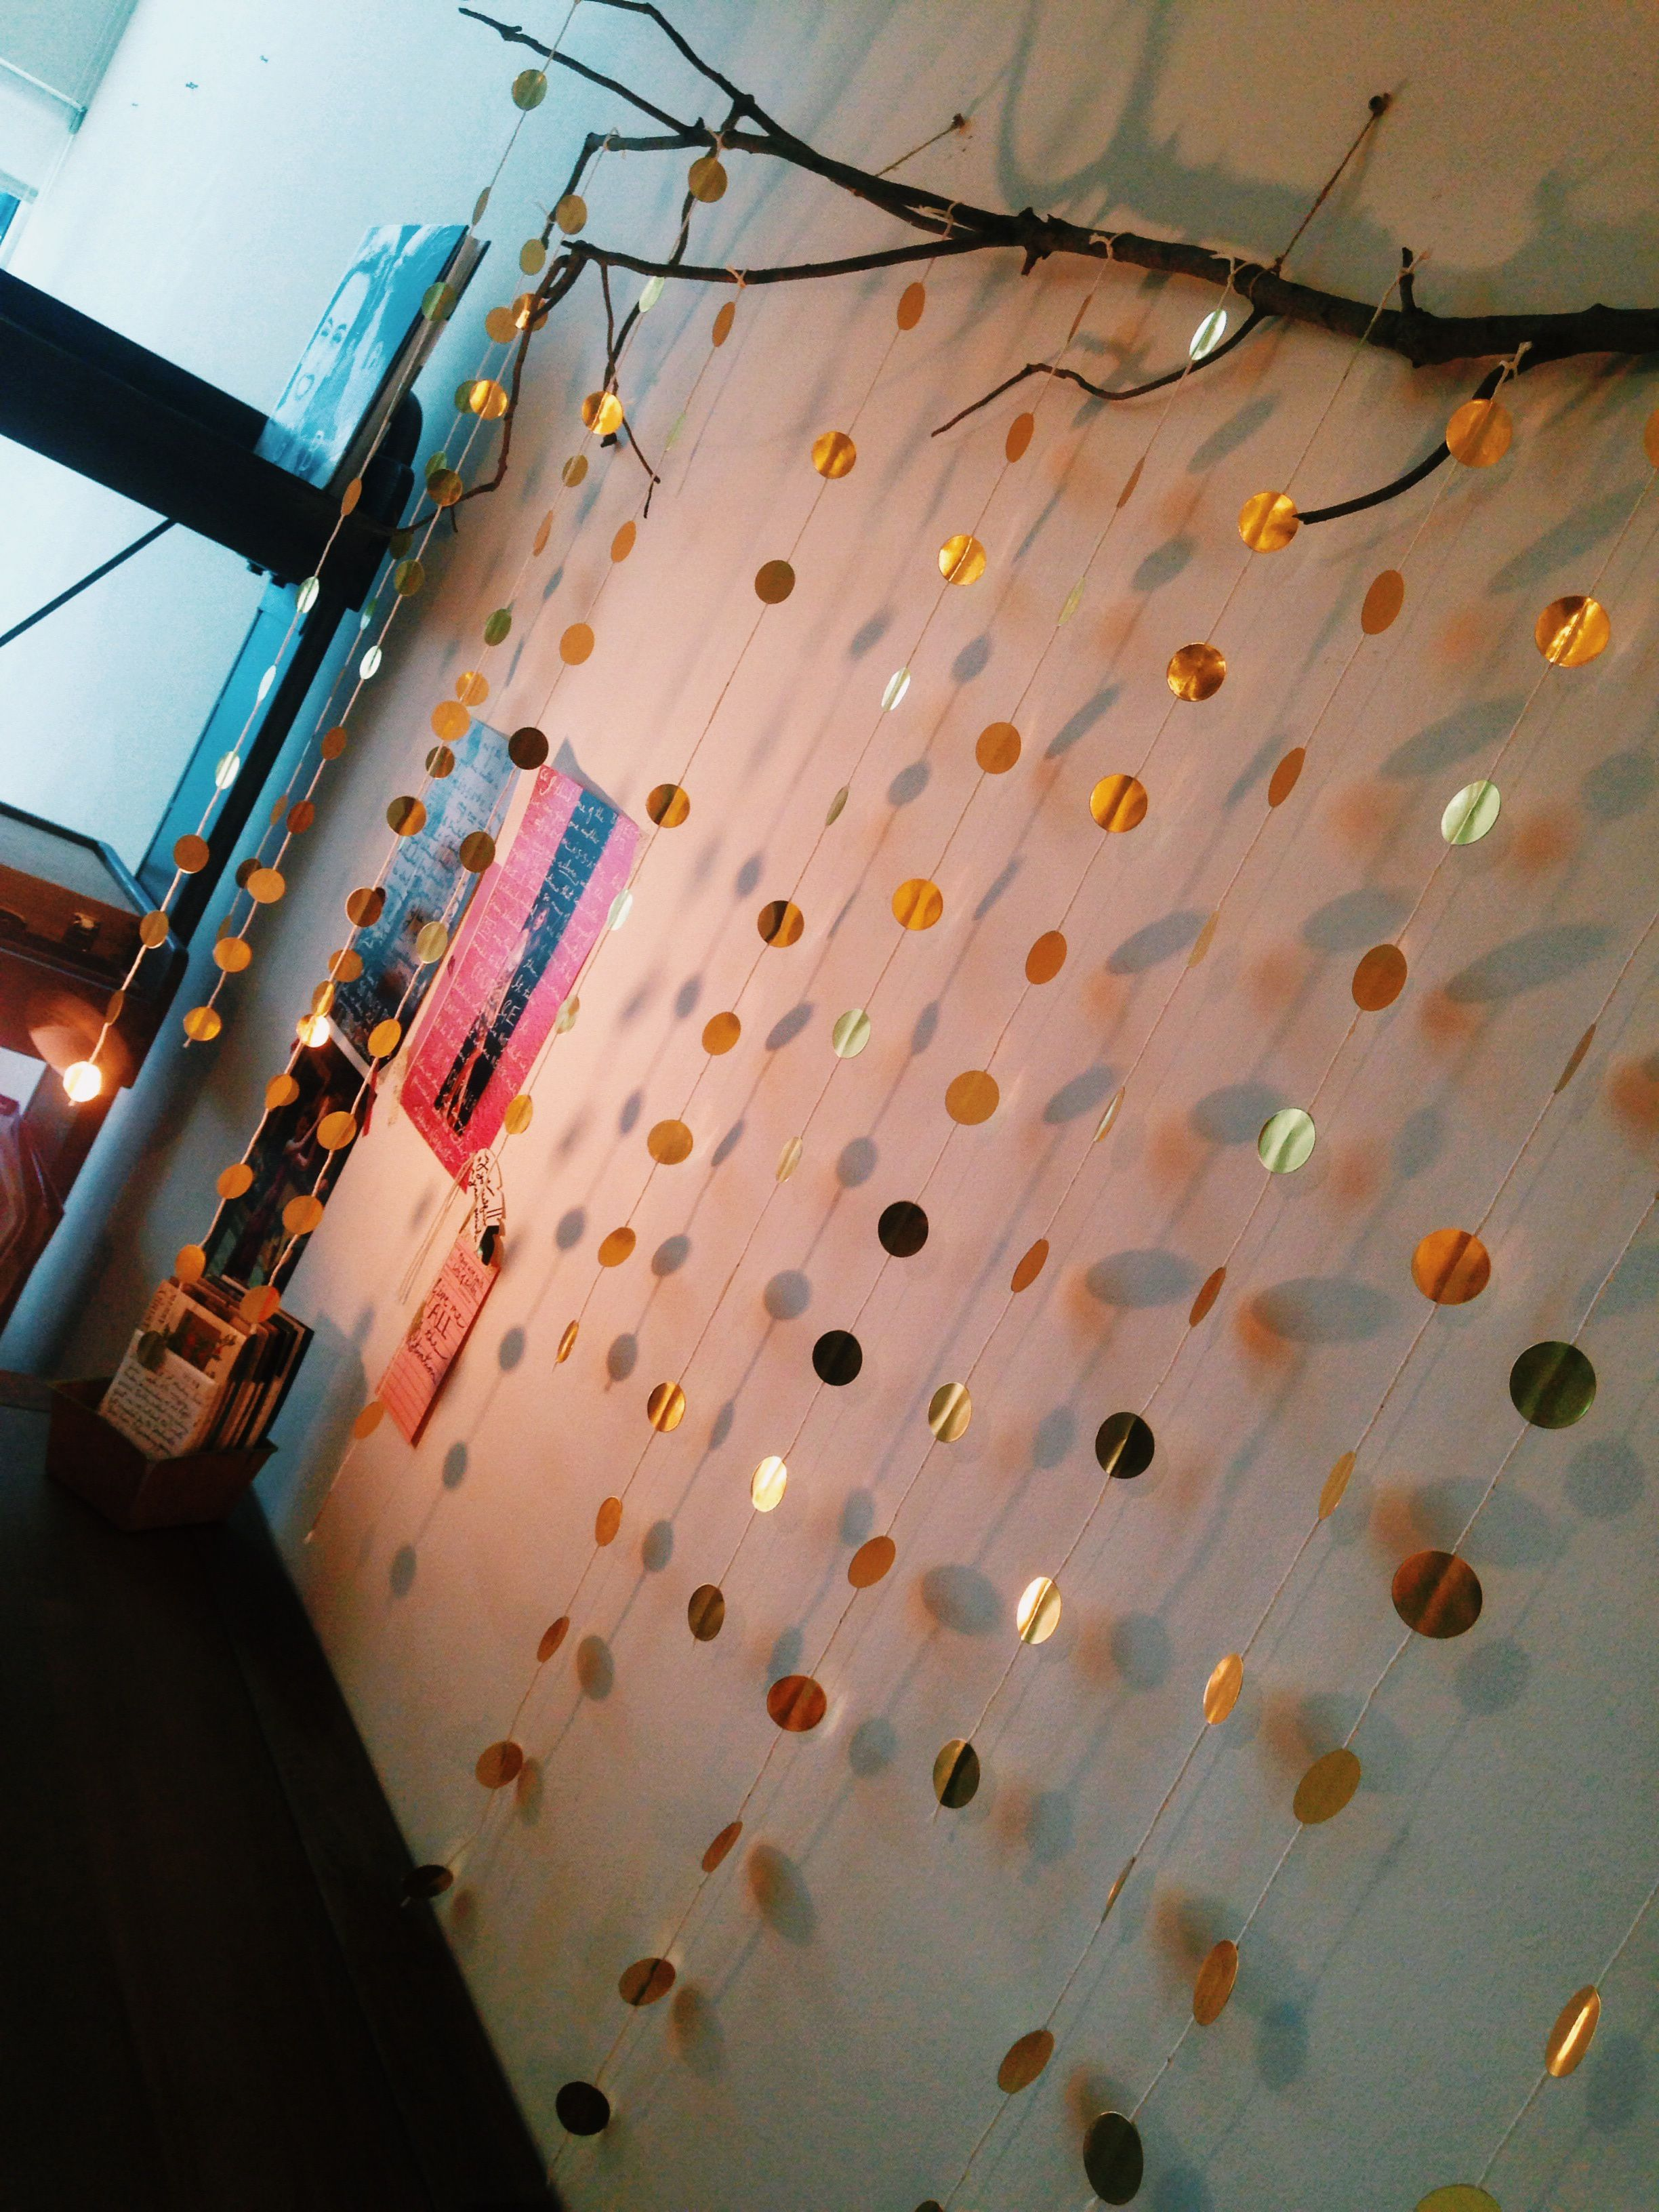 Wall Installation Art - Makipera.com & Wall Installation Art - Makipera.com | Abstract metal wall art ...